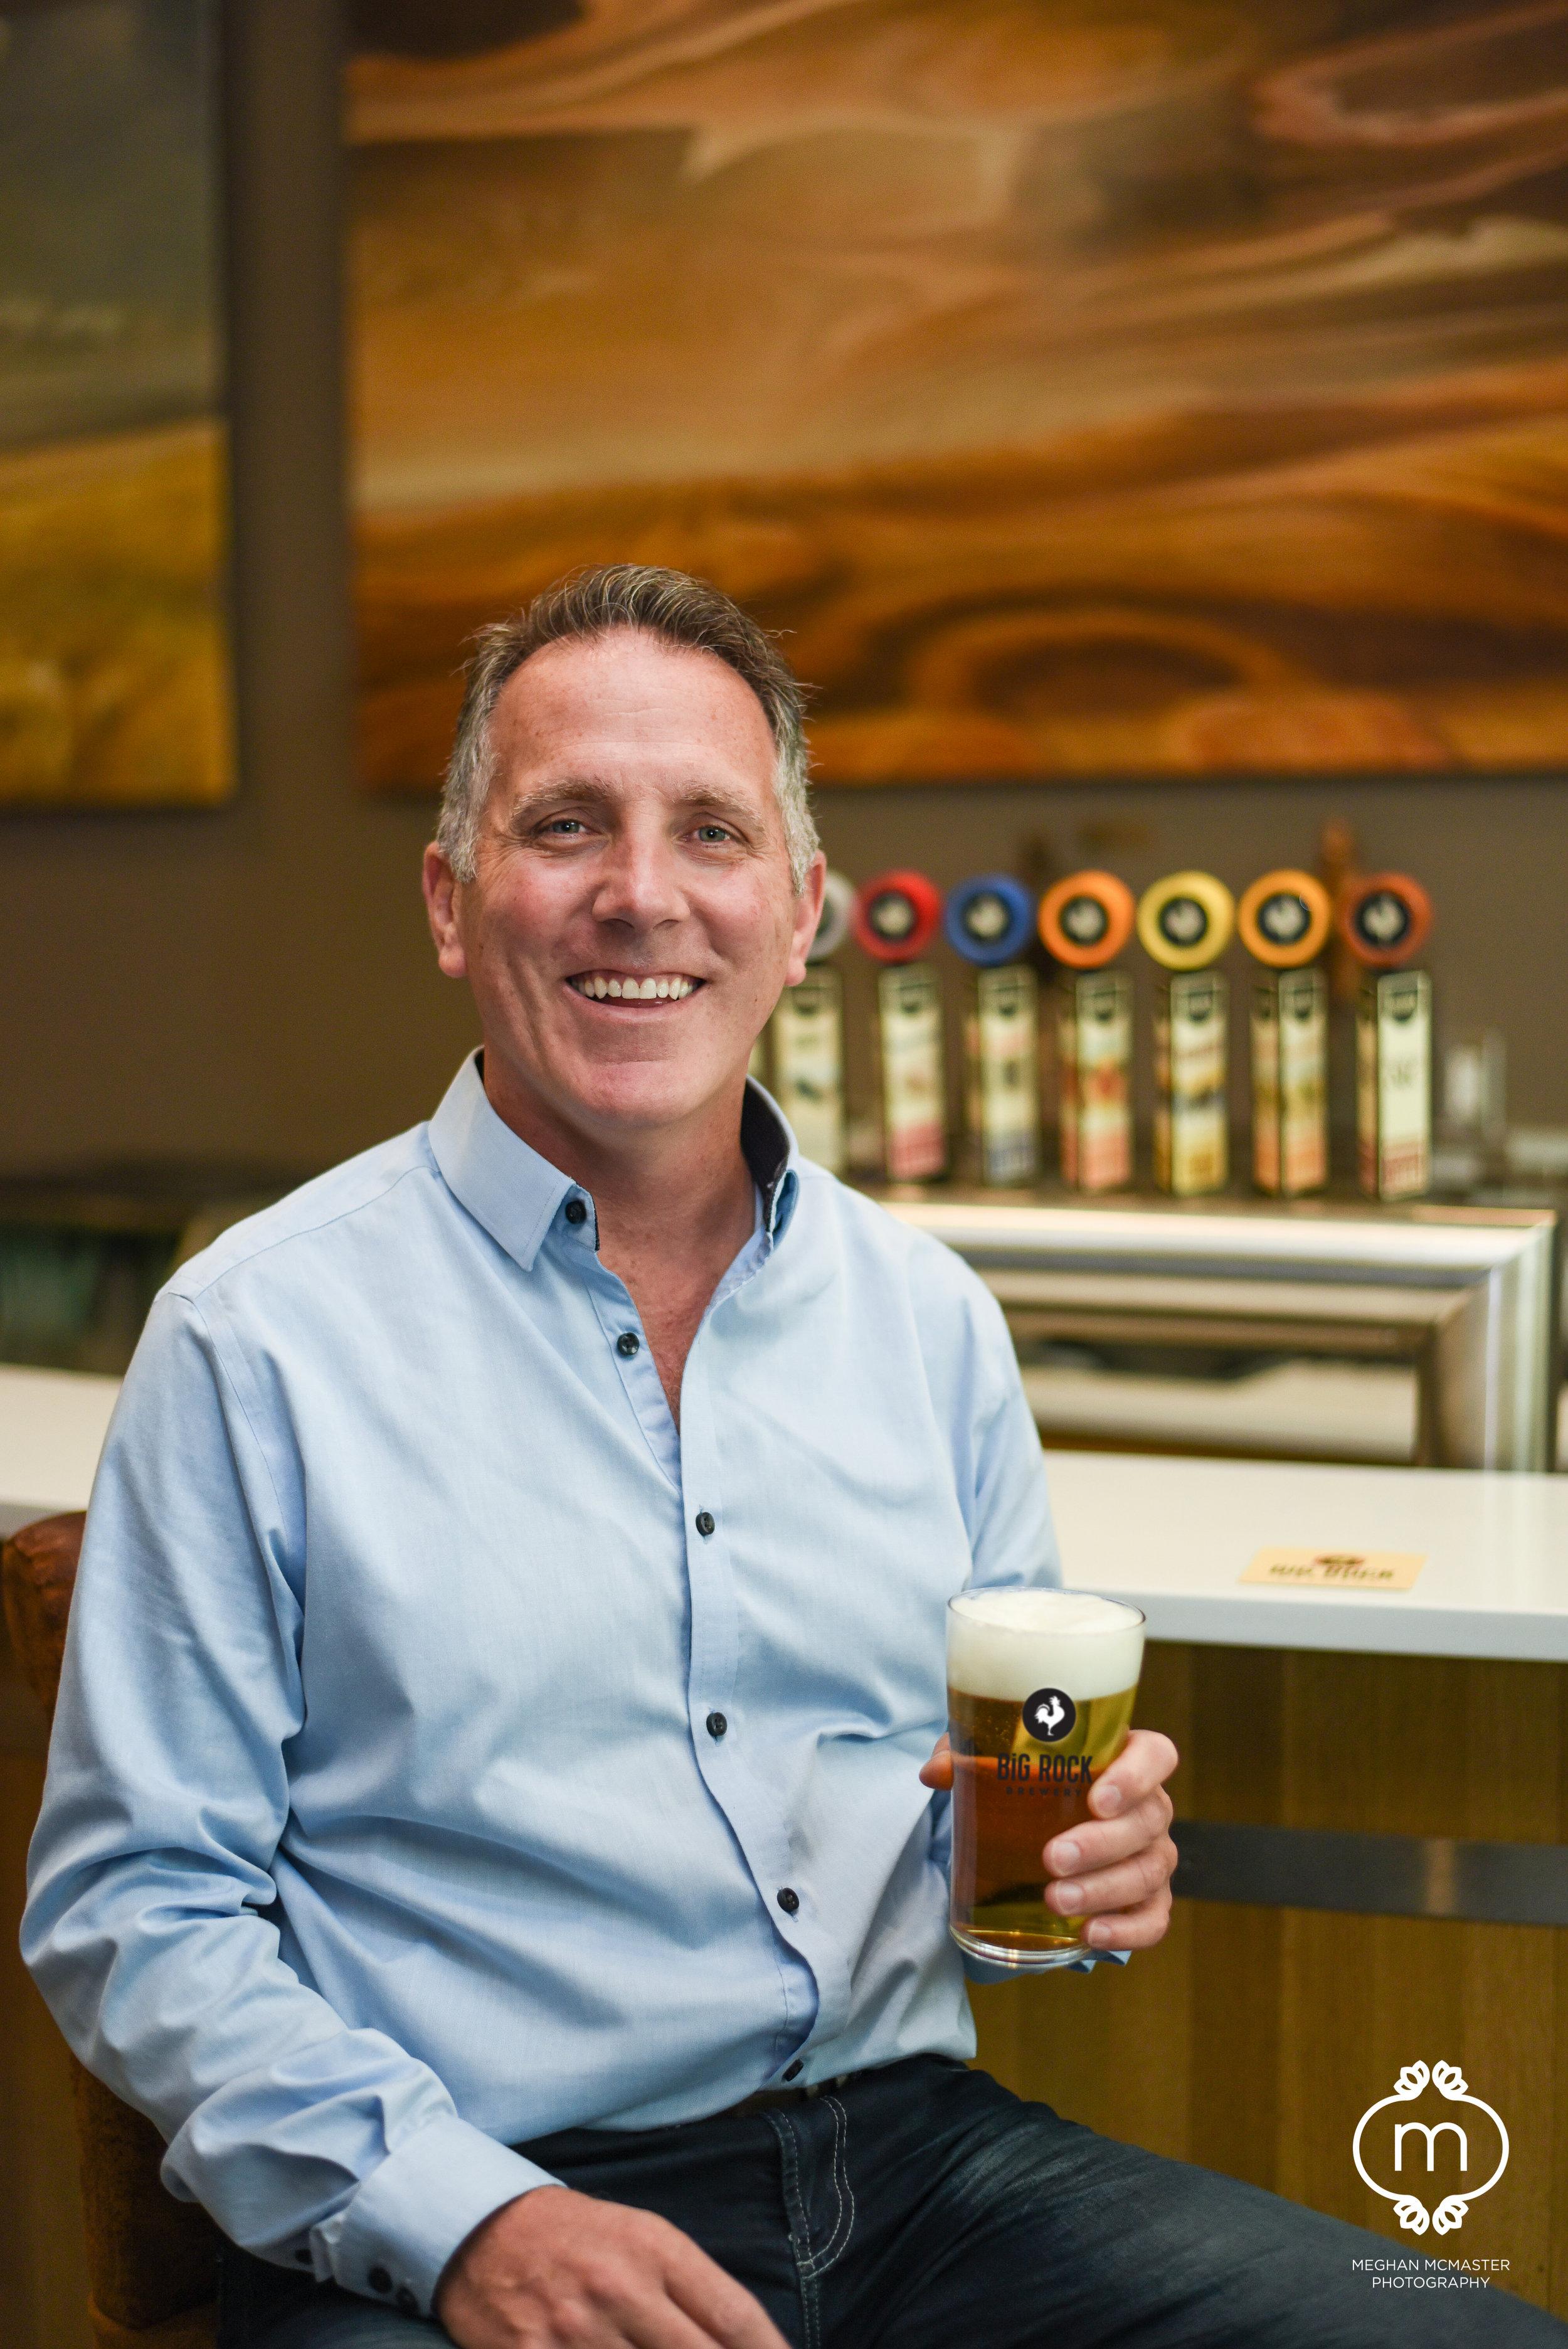 Big Rock Brewery CEO, Wayne Arsenault